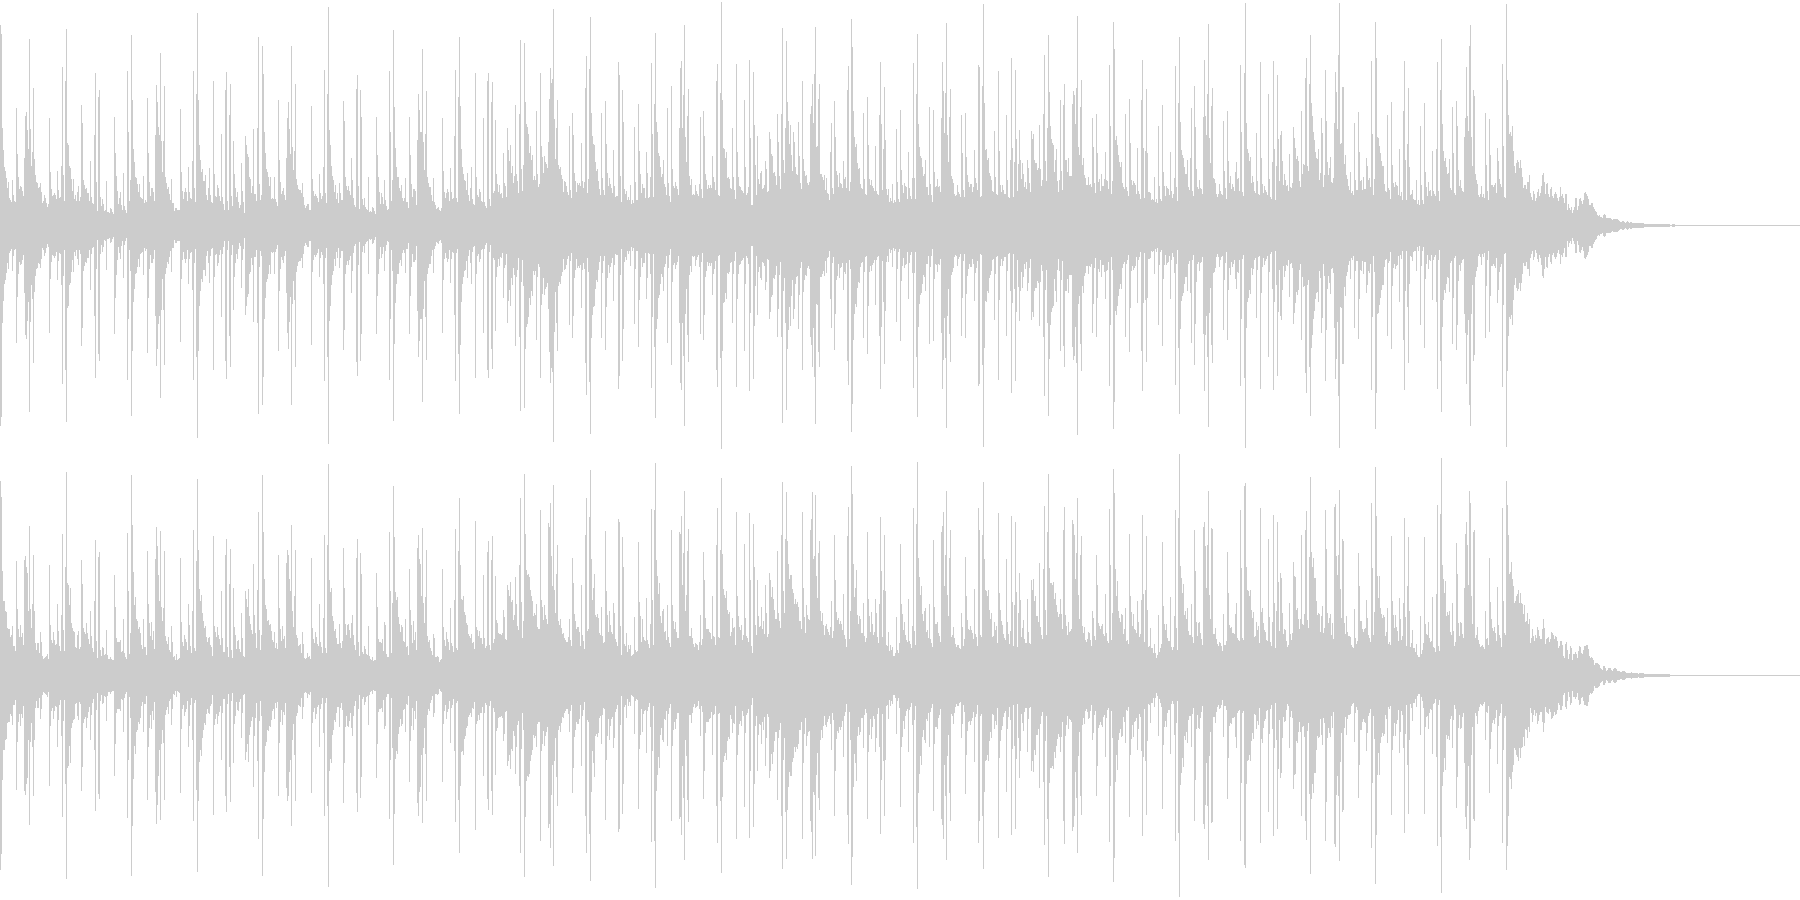 Pf「回転」和風現代ジャズの未再生の波形